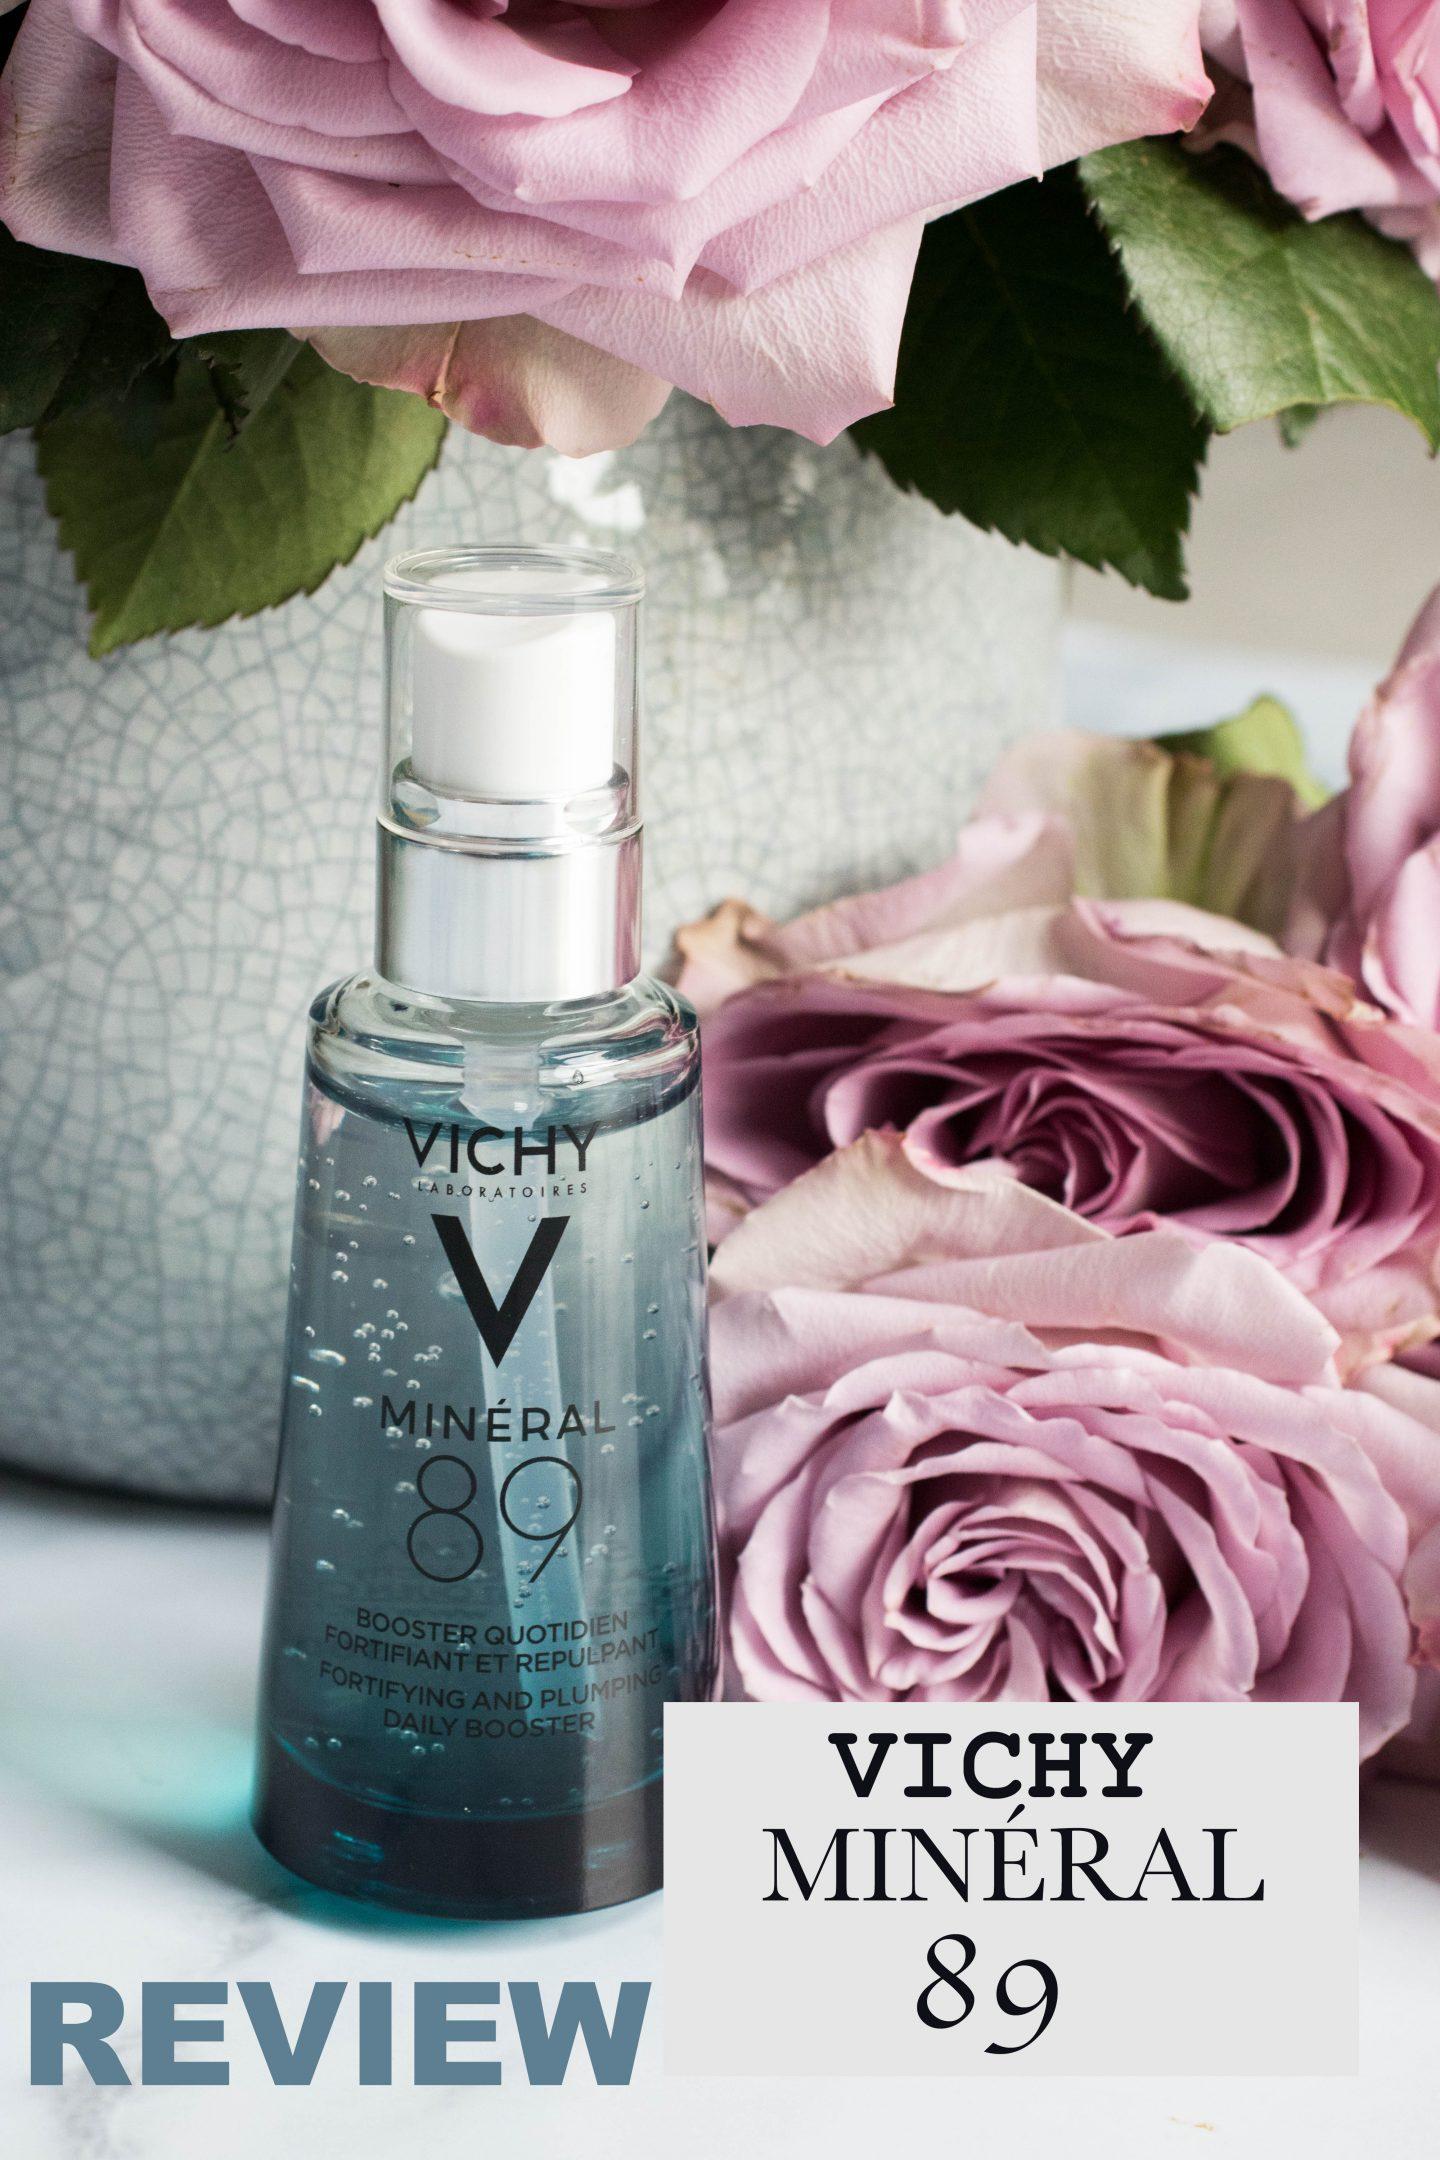 VICHY-MINÉRAL-89-Review